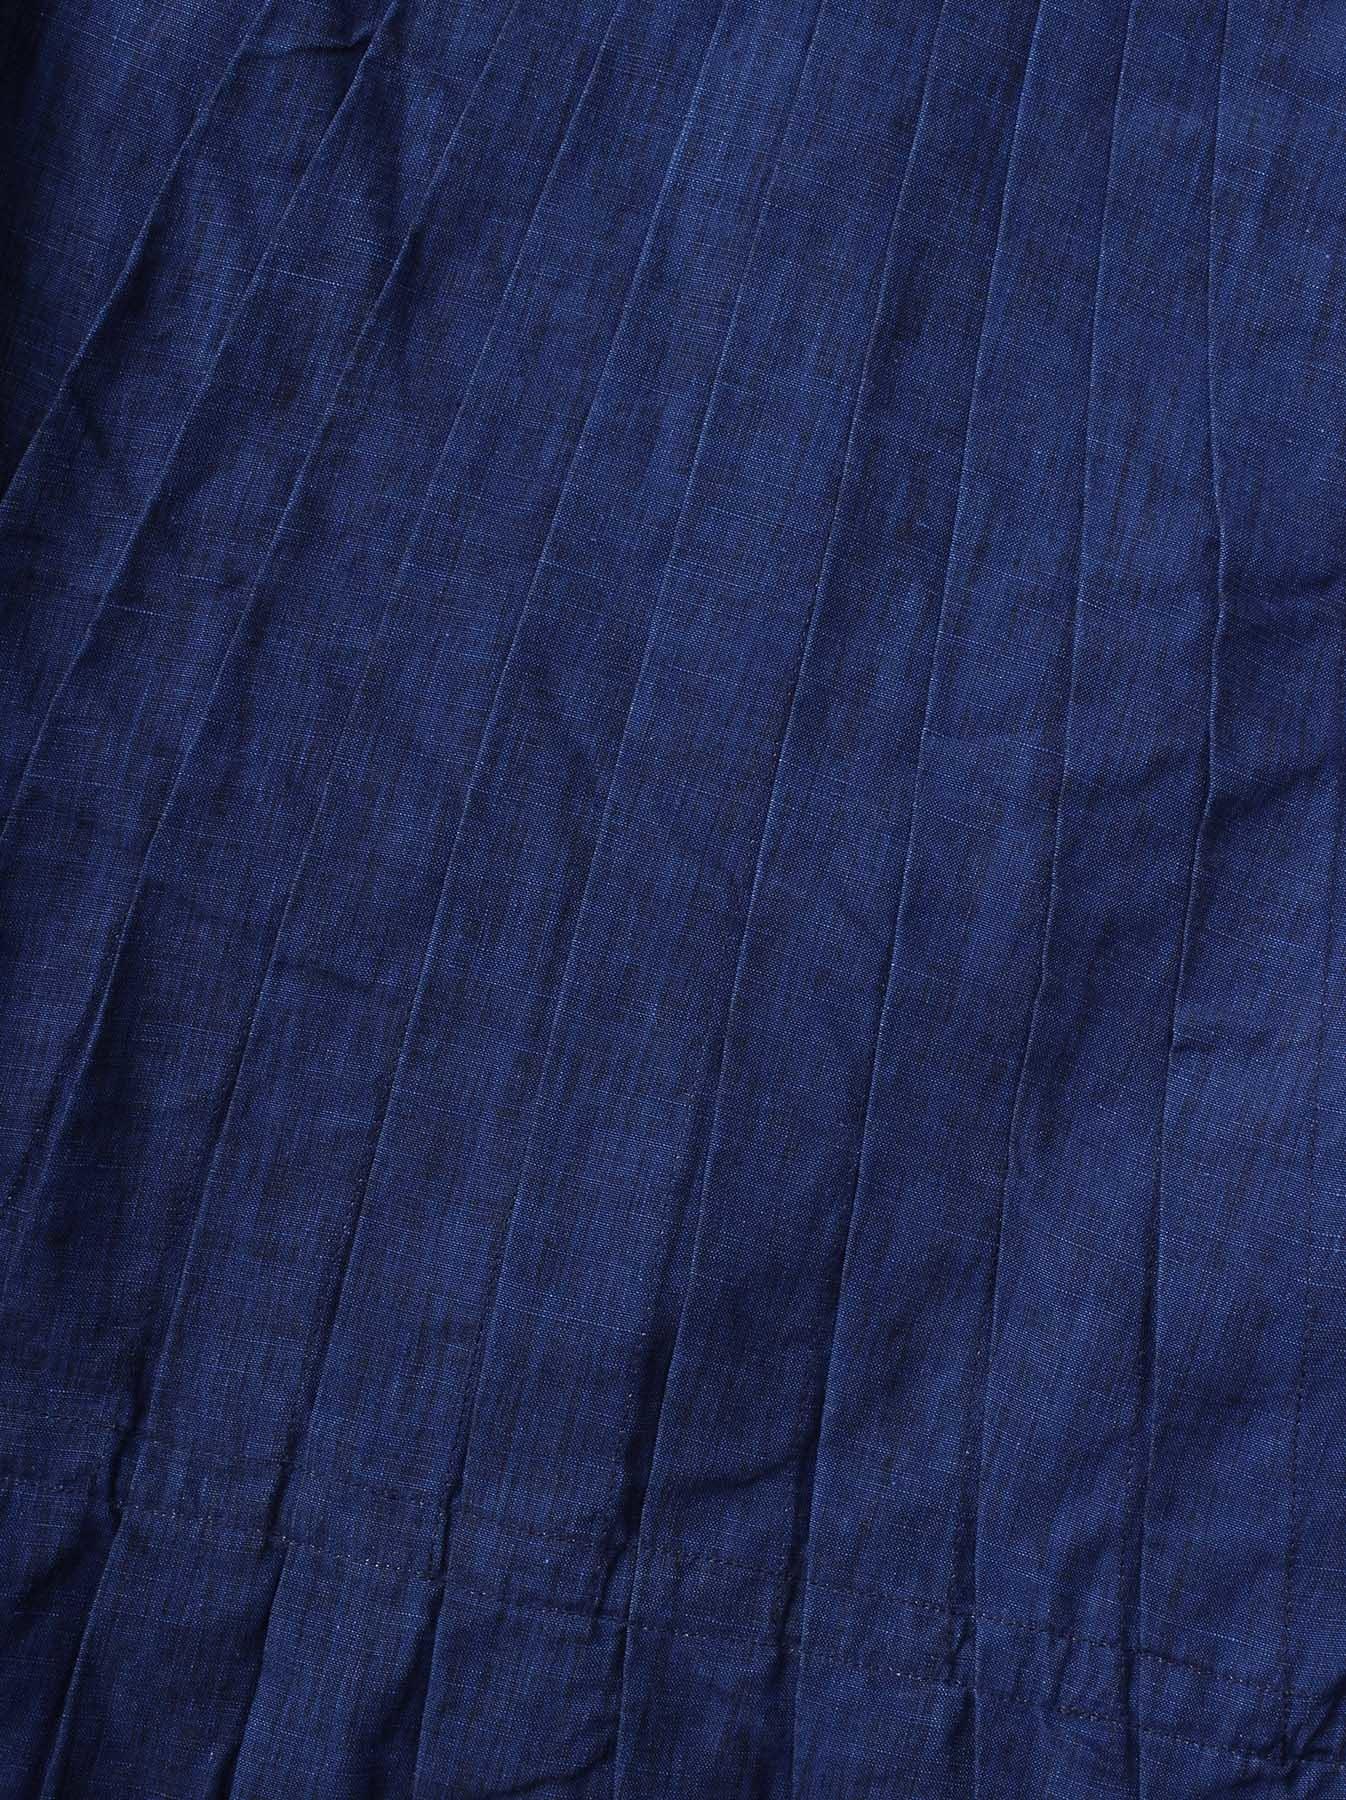 WH Indigo Linen Sleeveless Tuck Blouse-9